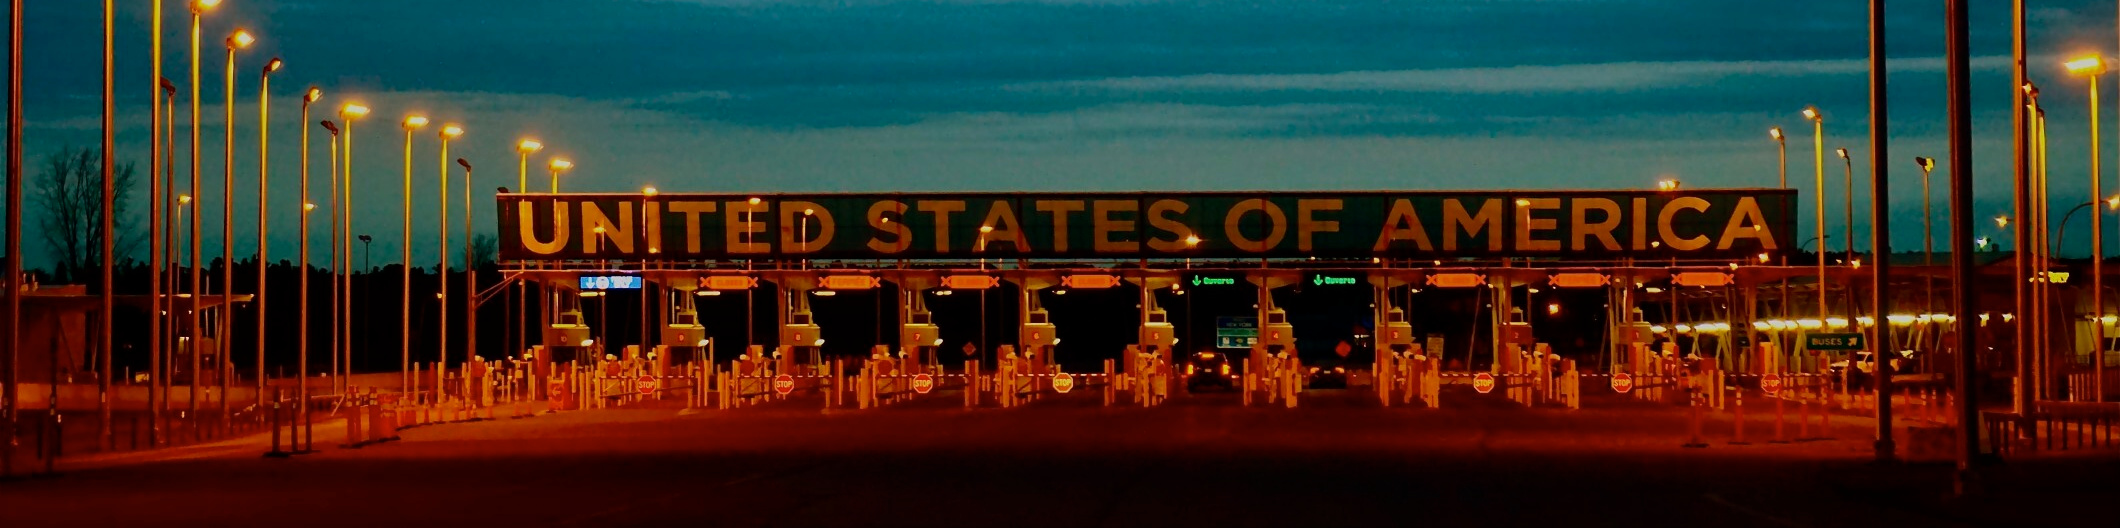 GSA LPOE United States Border Crossing